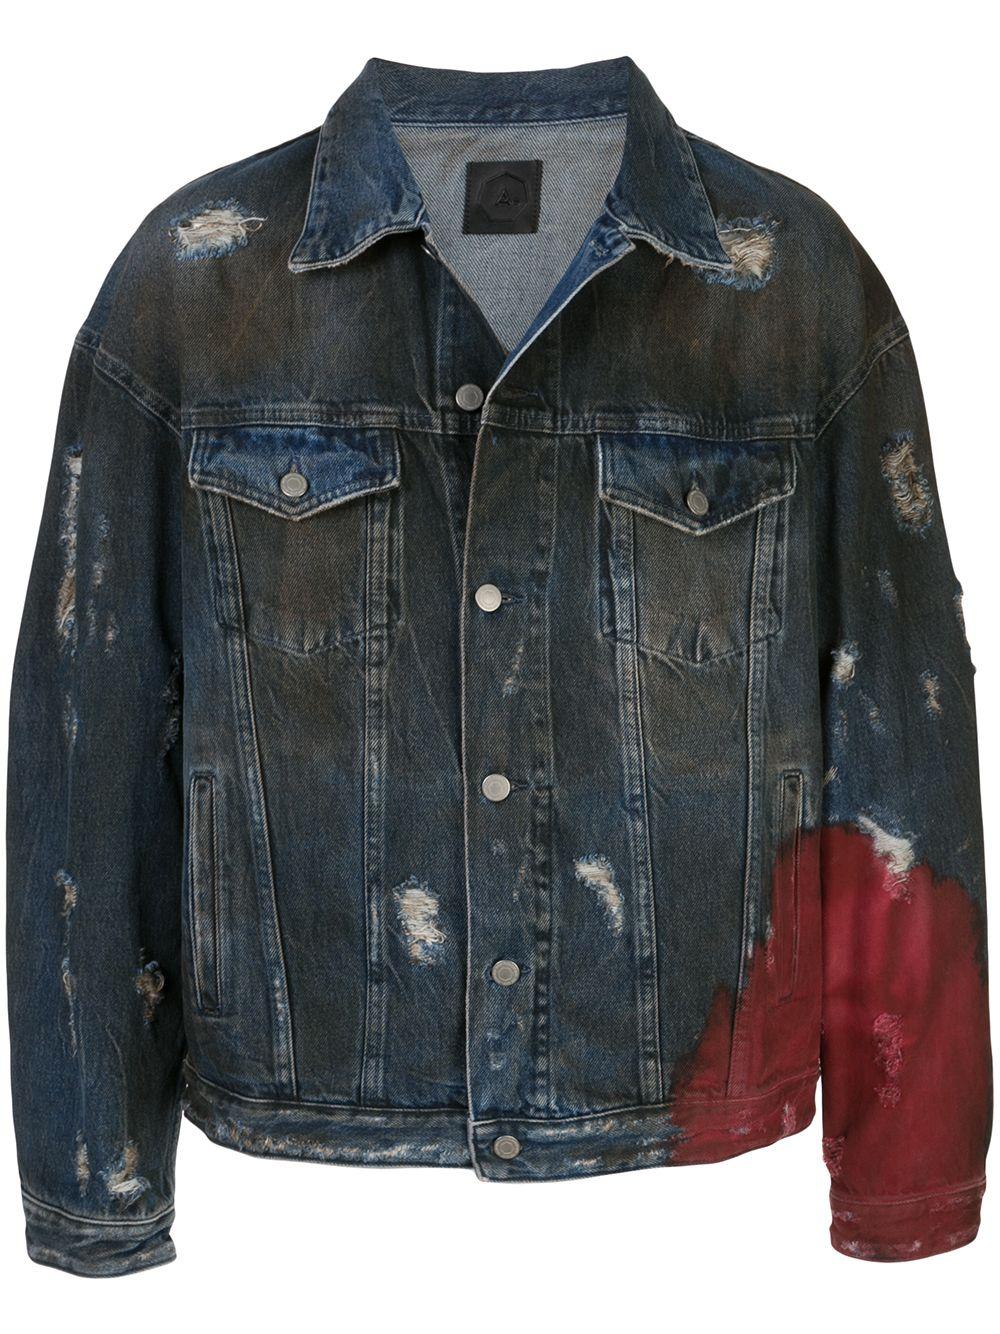 Alchemist | Alchemist джинсовая куртка с прорезями | Clouty